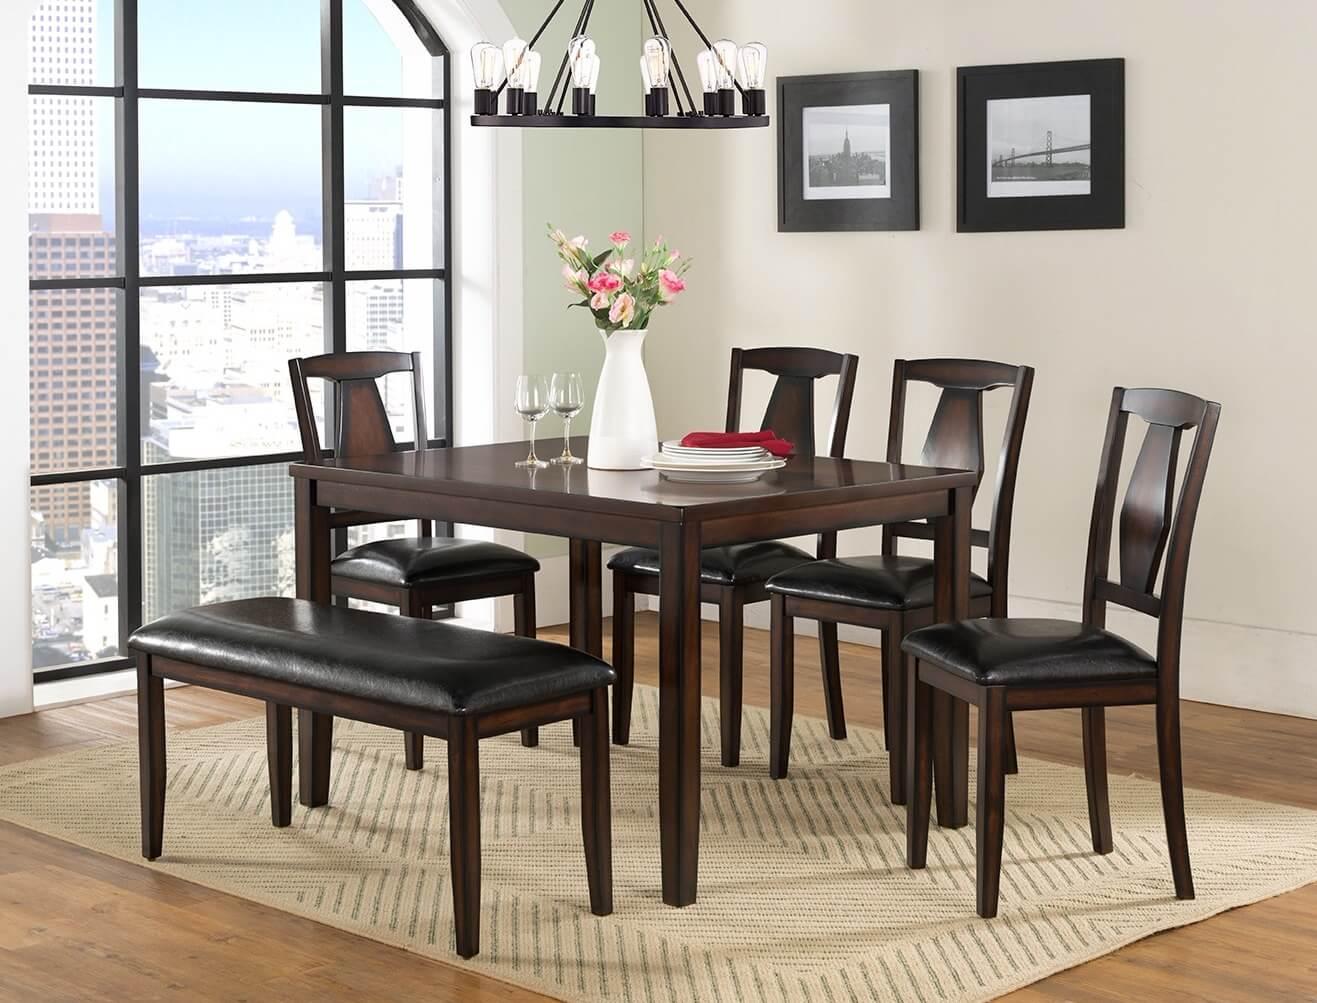 Sedona 6 Piece Dining Set By Vilo Home Casa Leaders Inc